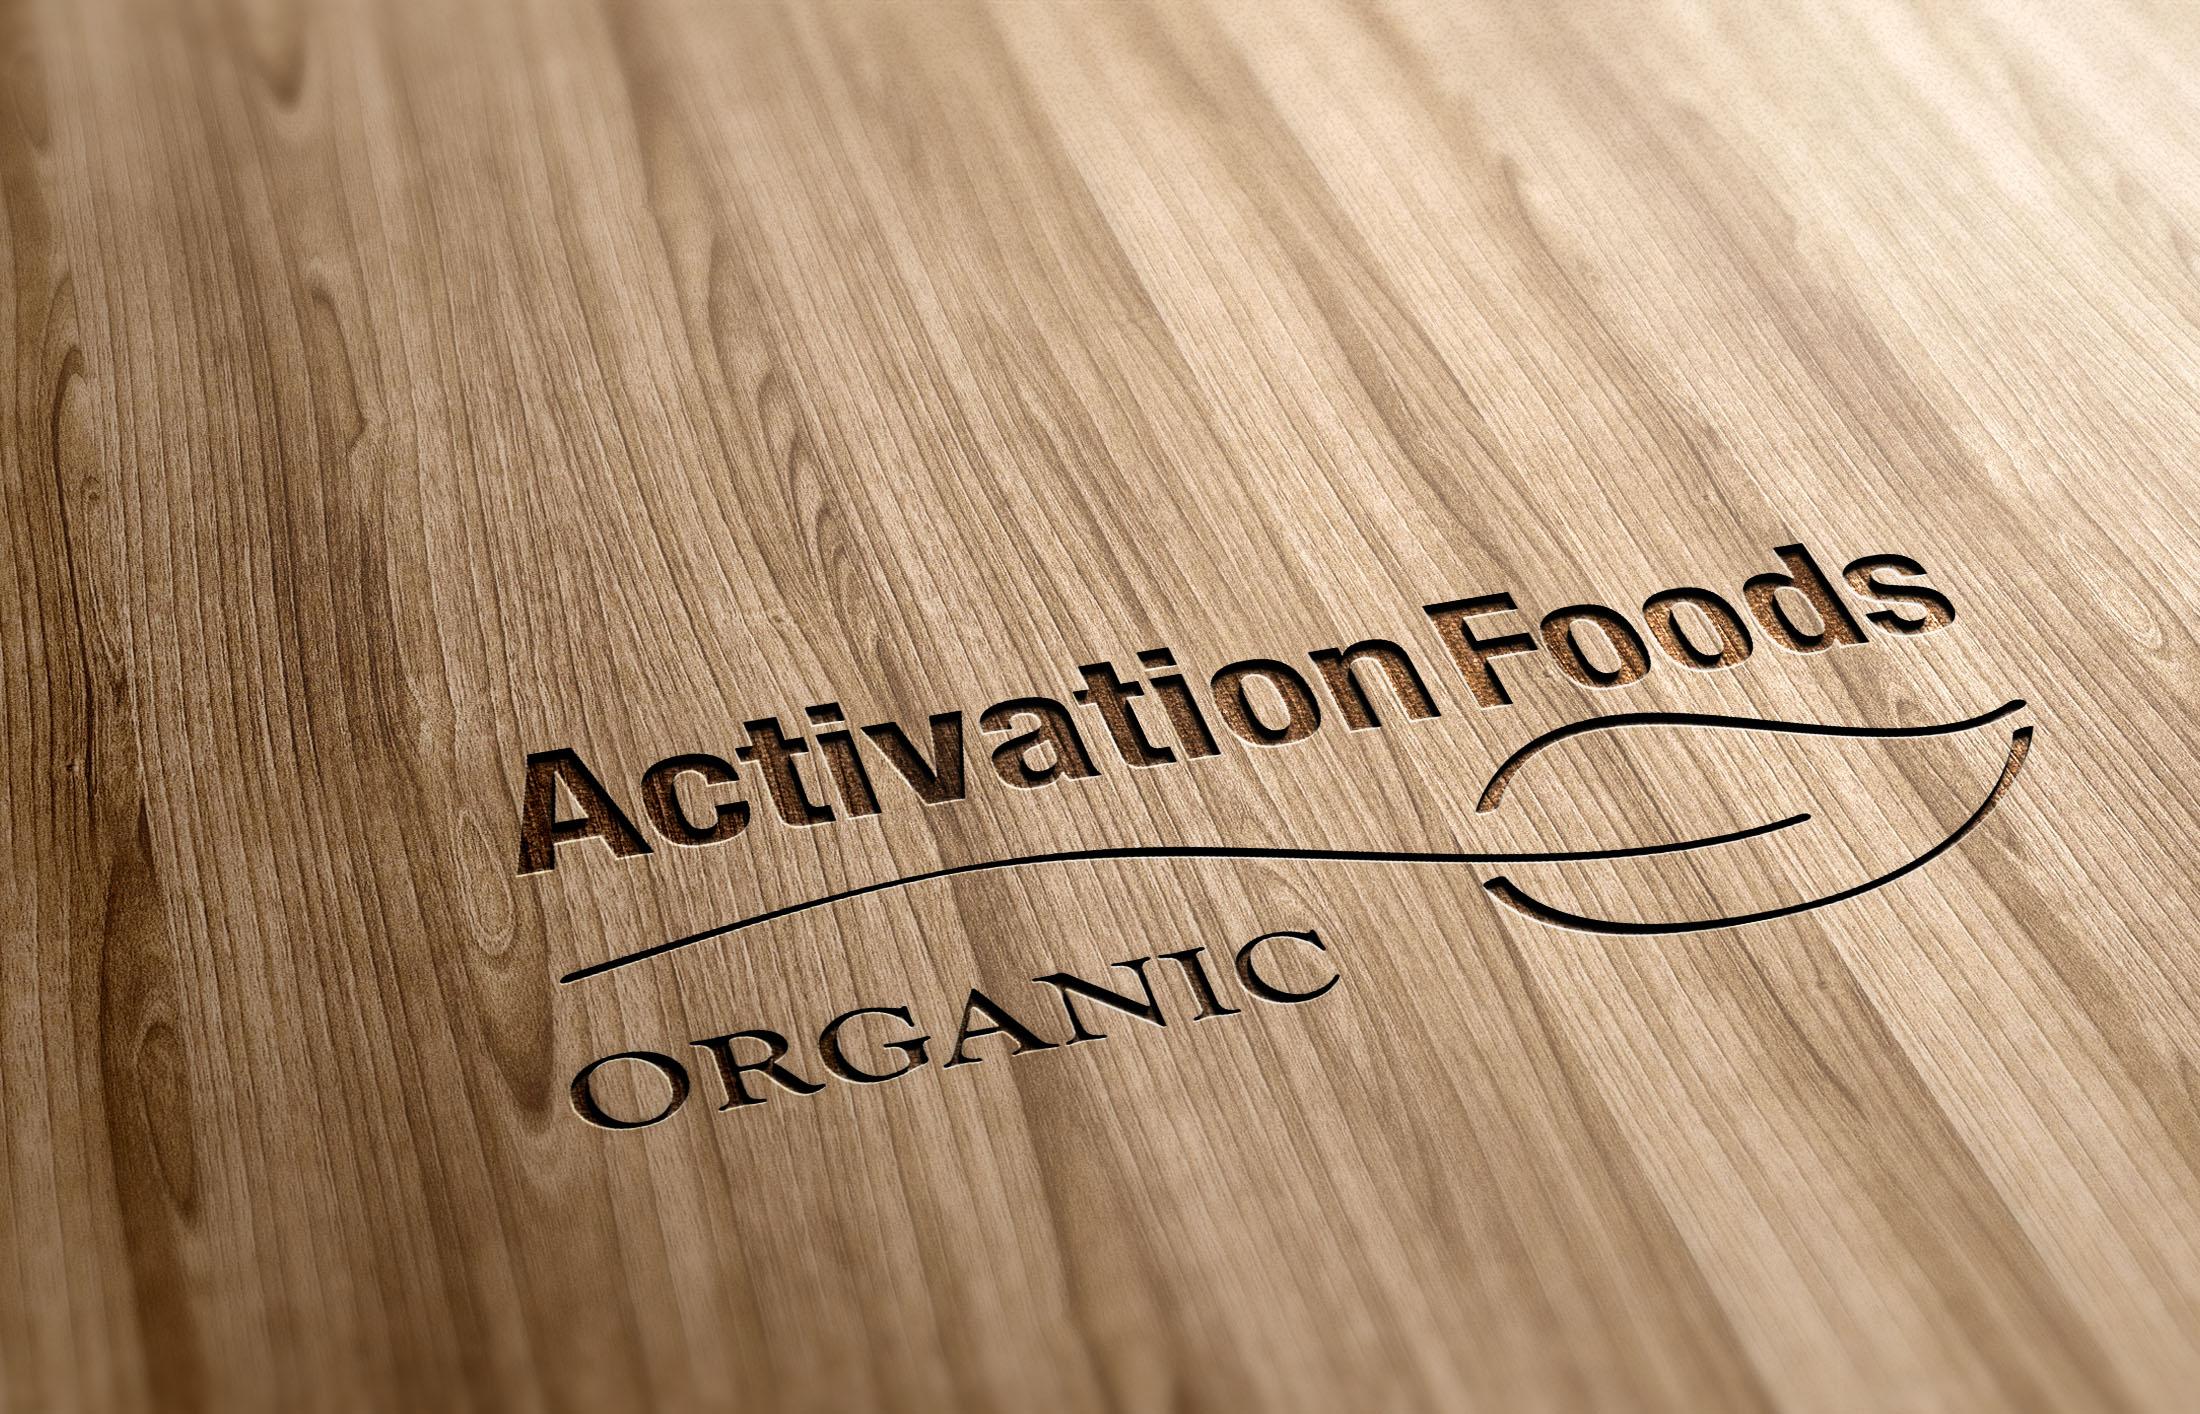 ActivationLogoInWood.jpg